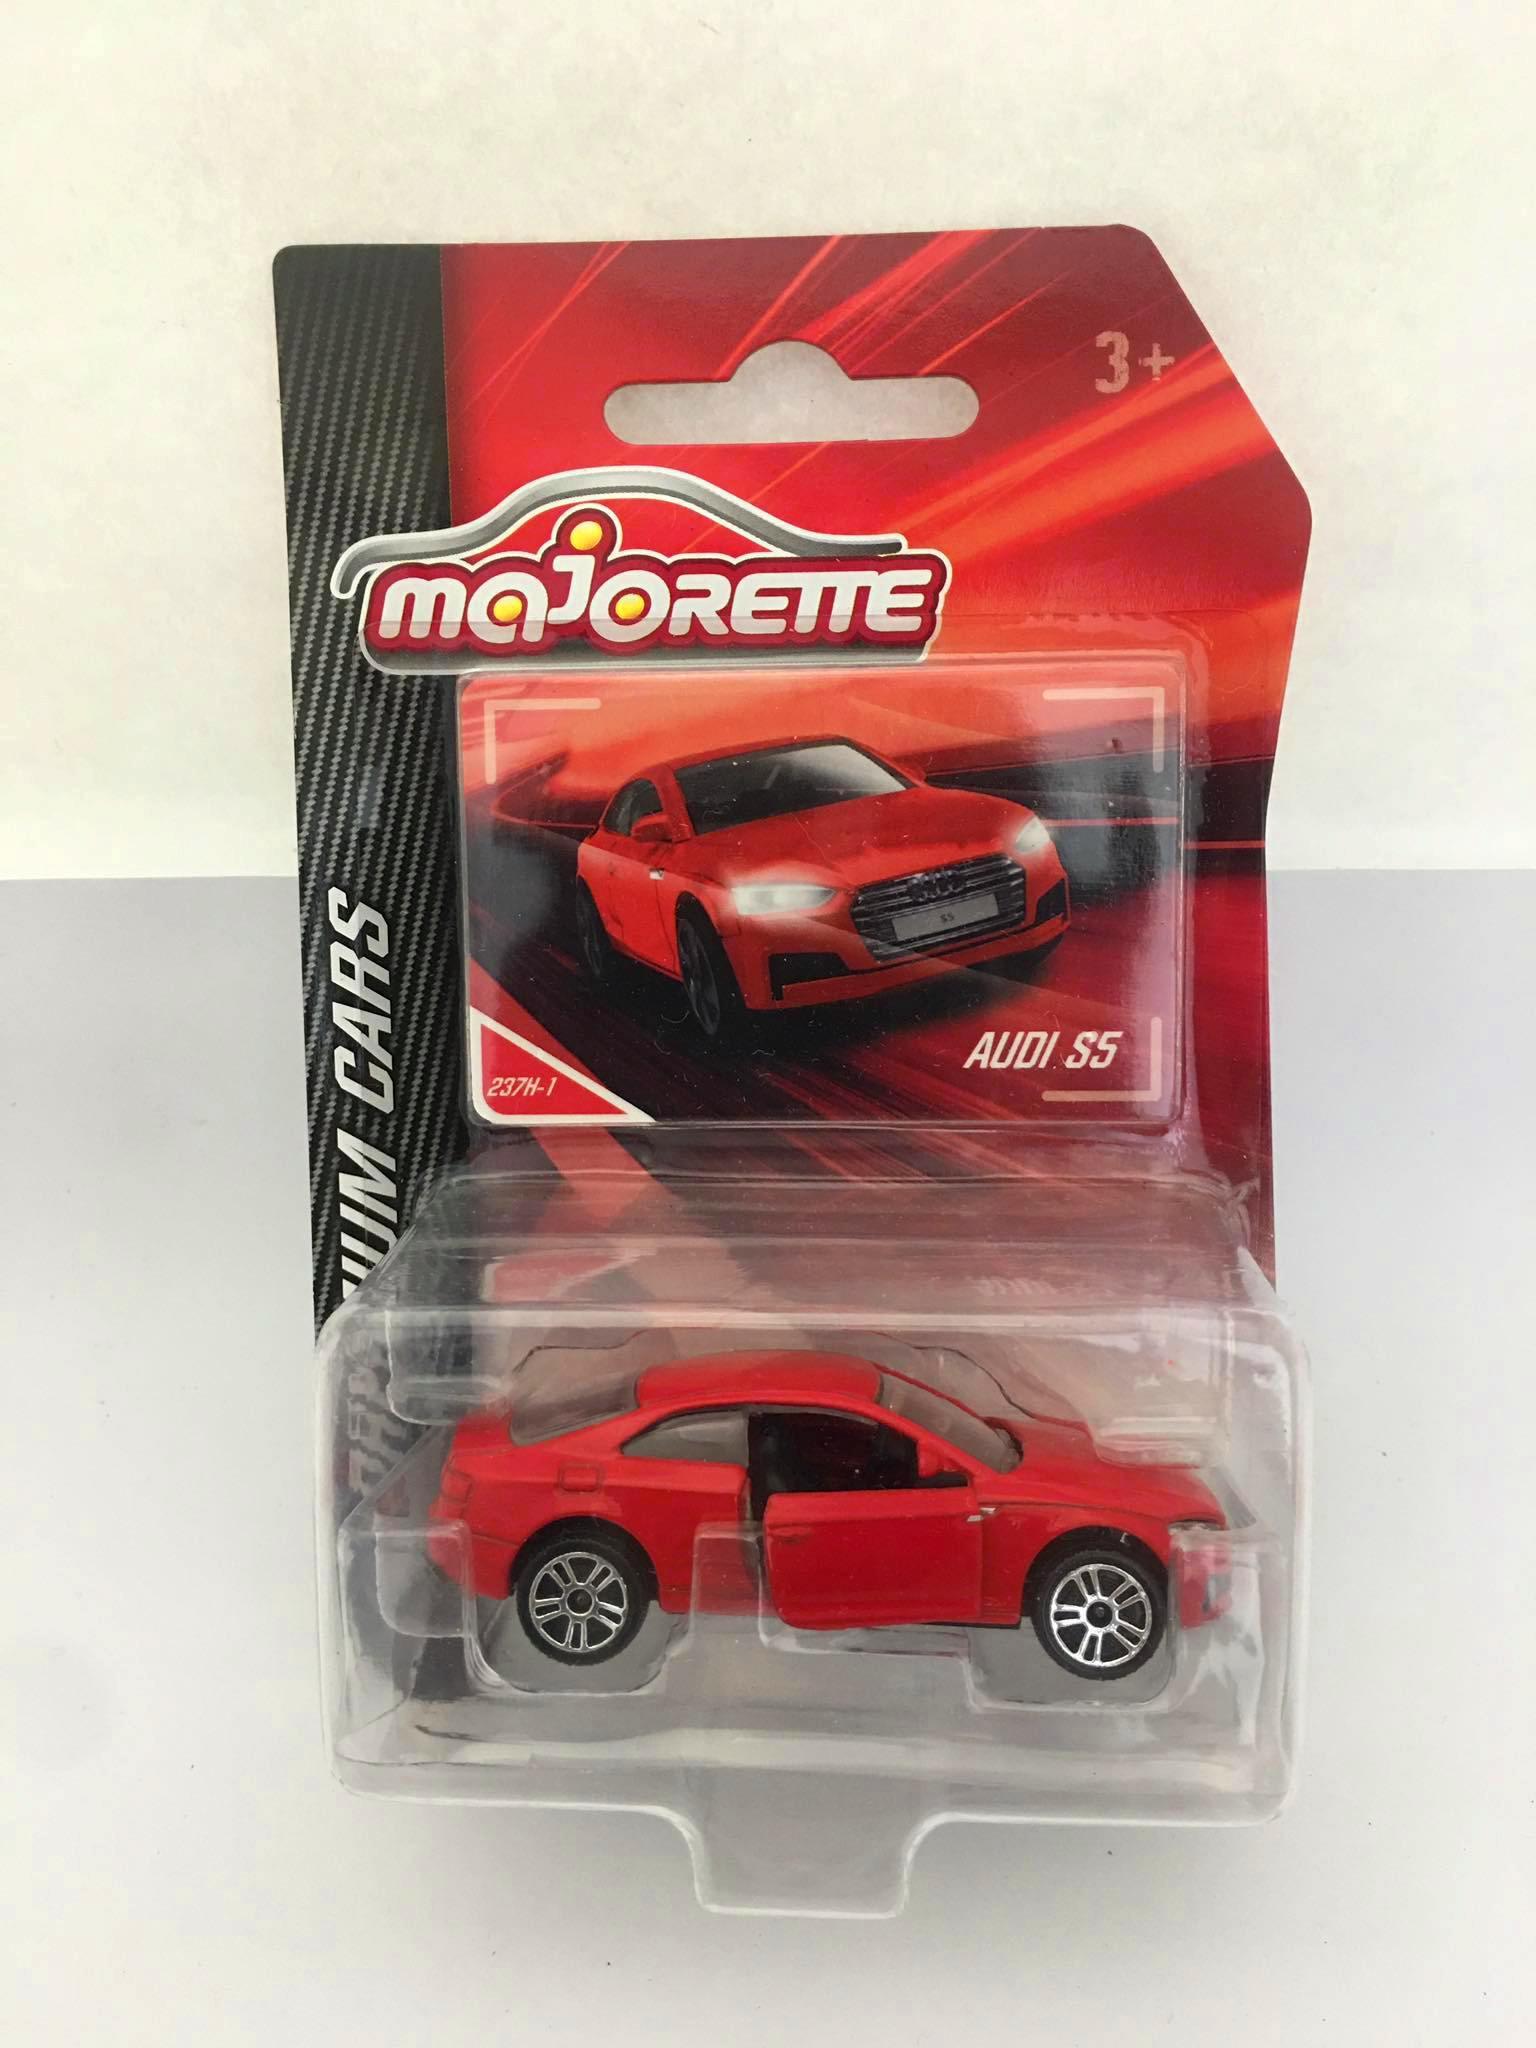 Majorette - Audi S5 Vermelho - Premium Cars